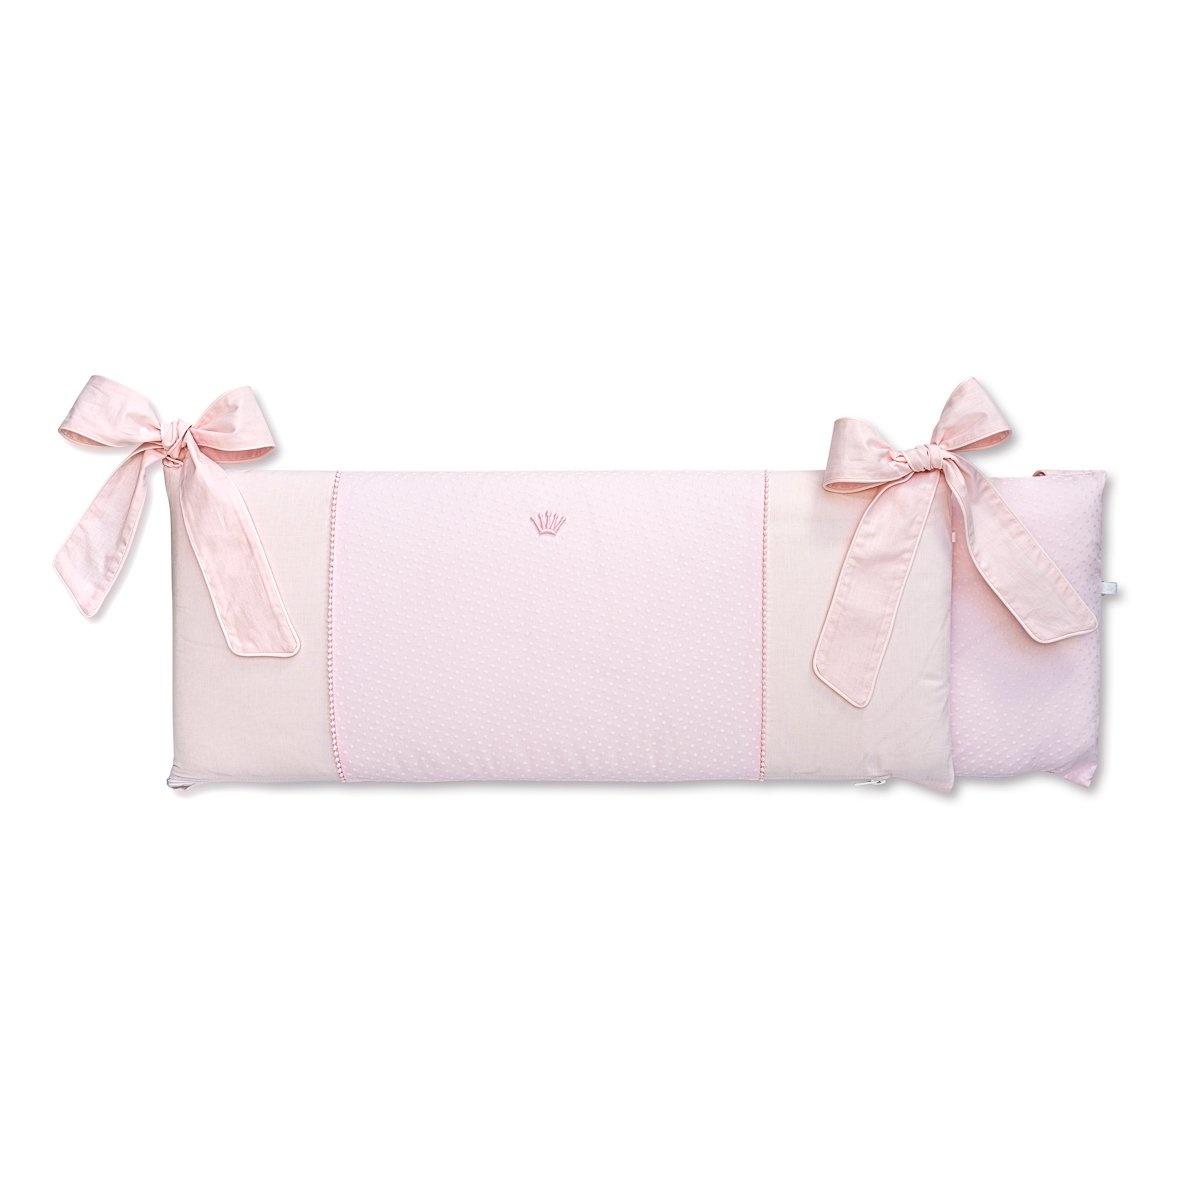 Bedomranding  70cm First Pretty pink-1